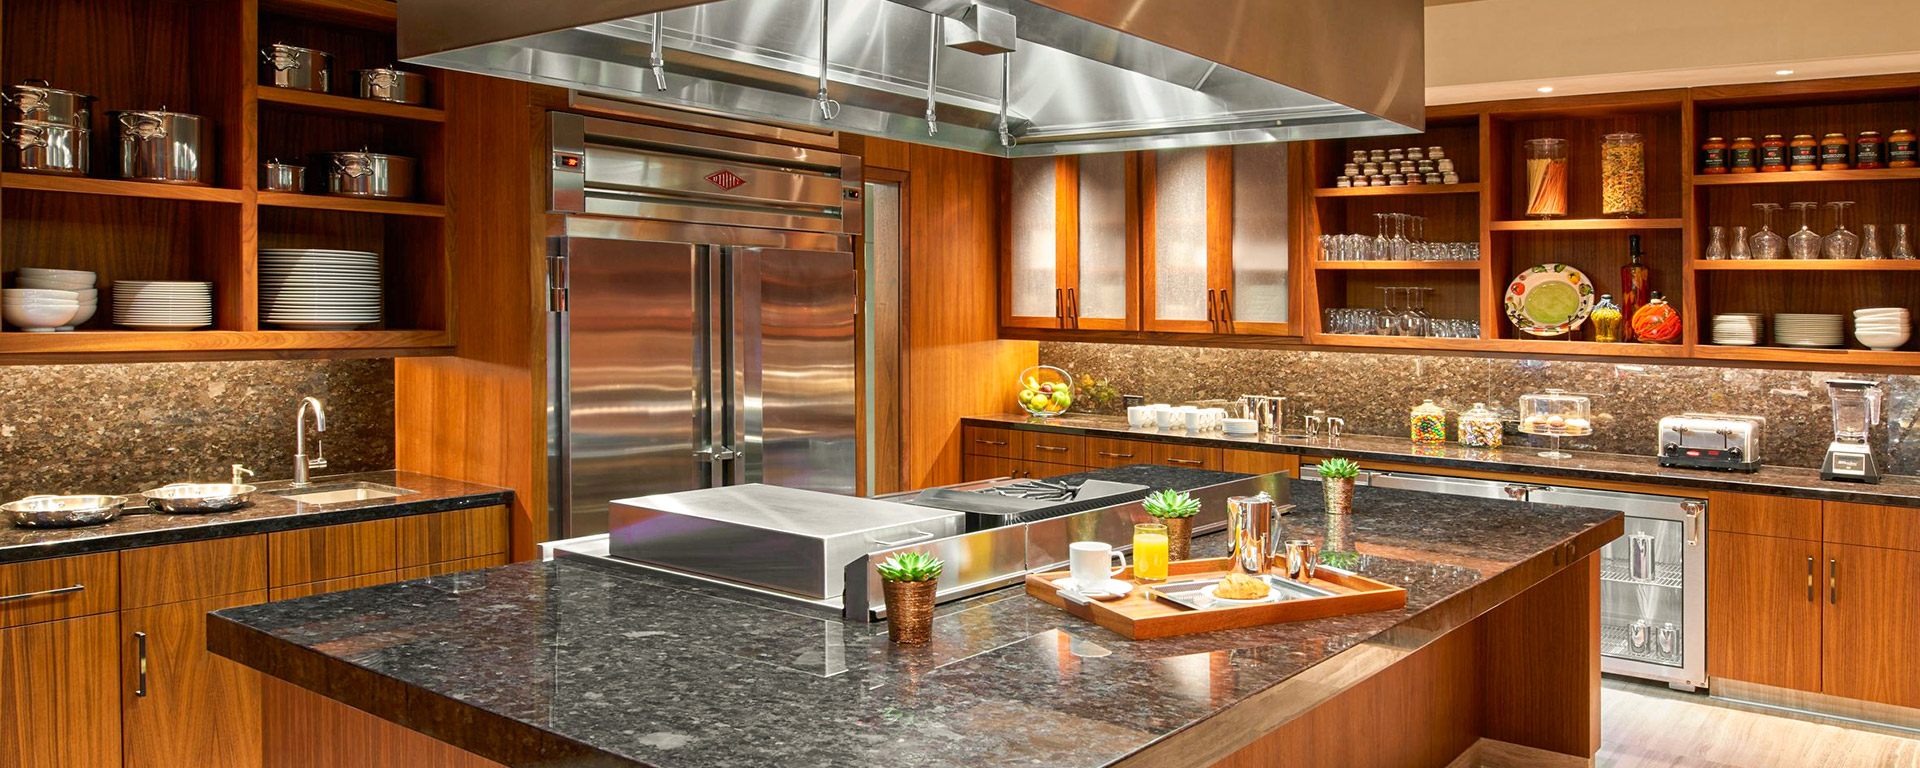 The Clement Palo Alto The kitchen